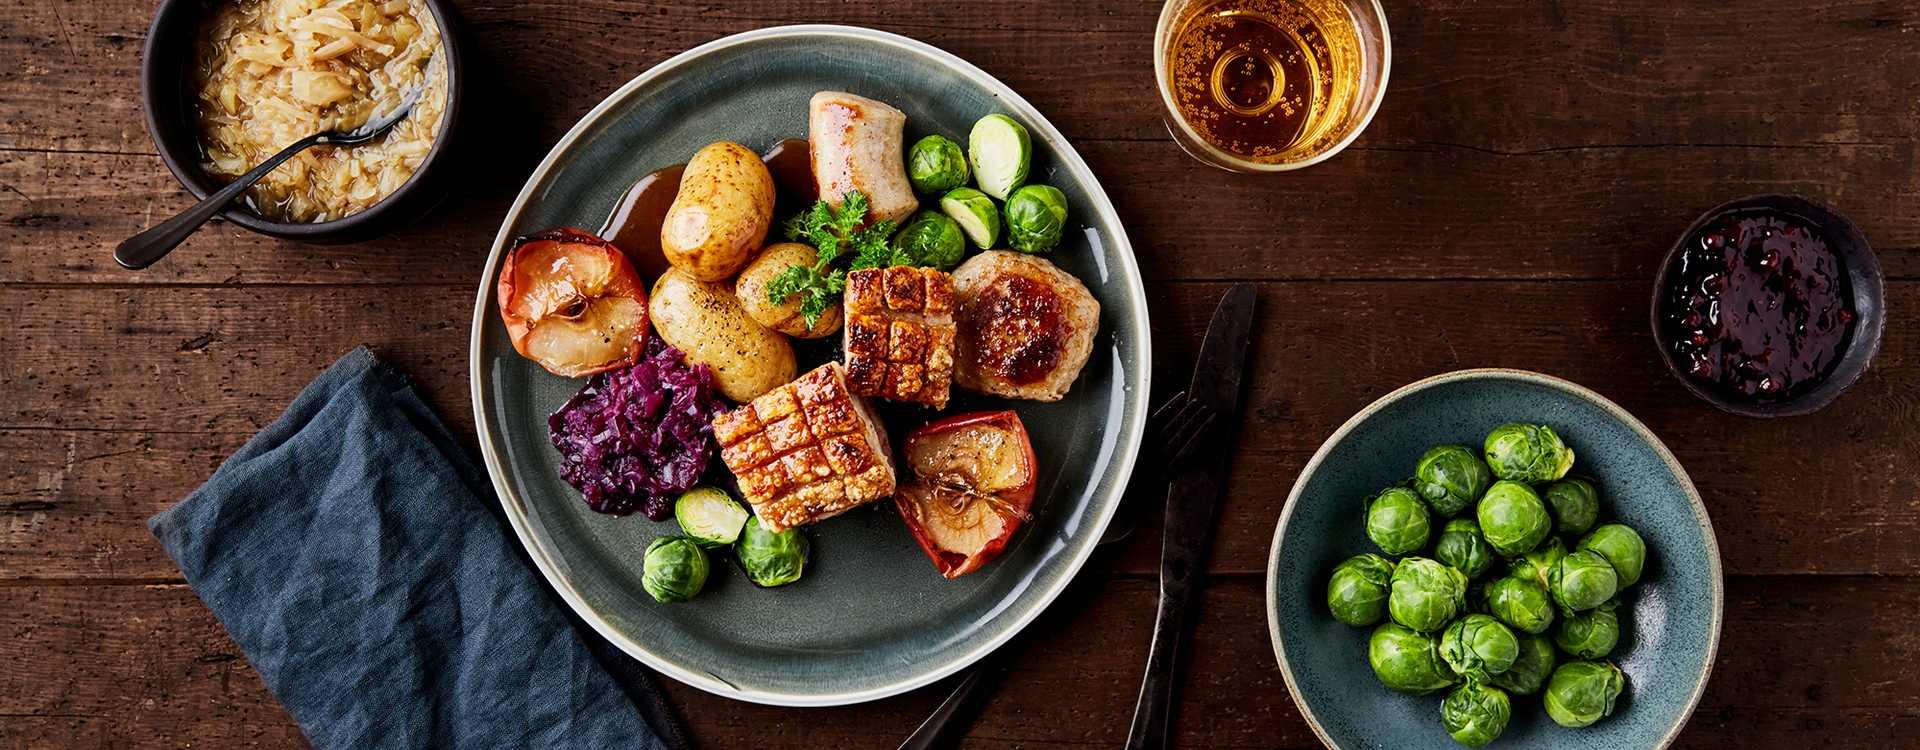 Klassisk ribbe med poteter, brun saus, rødkål, tyttebær, surkål, medisterkaker og julepølse